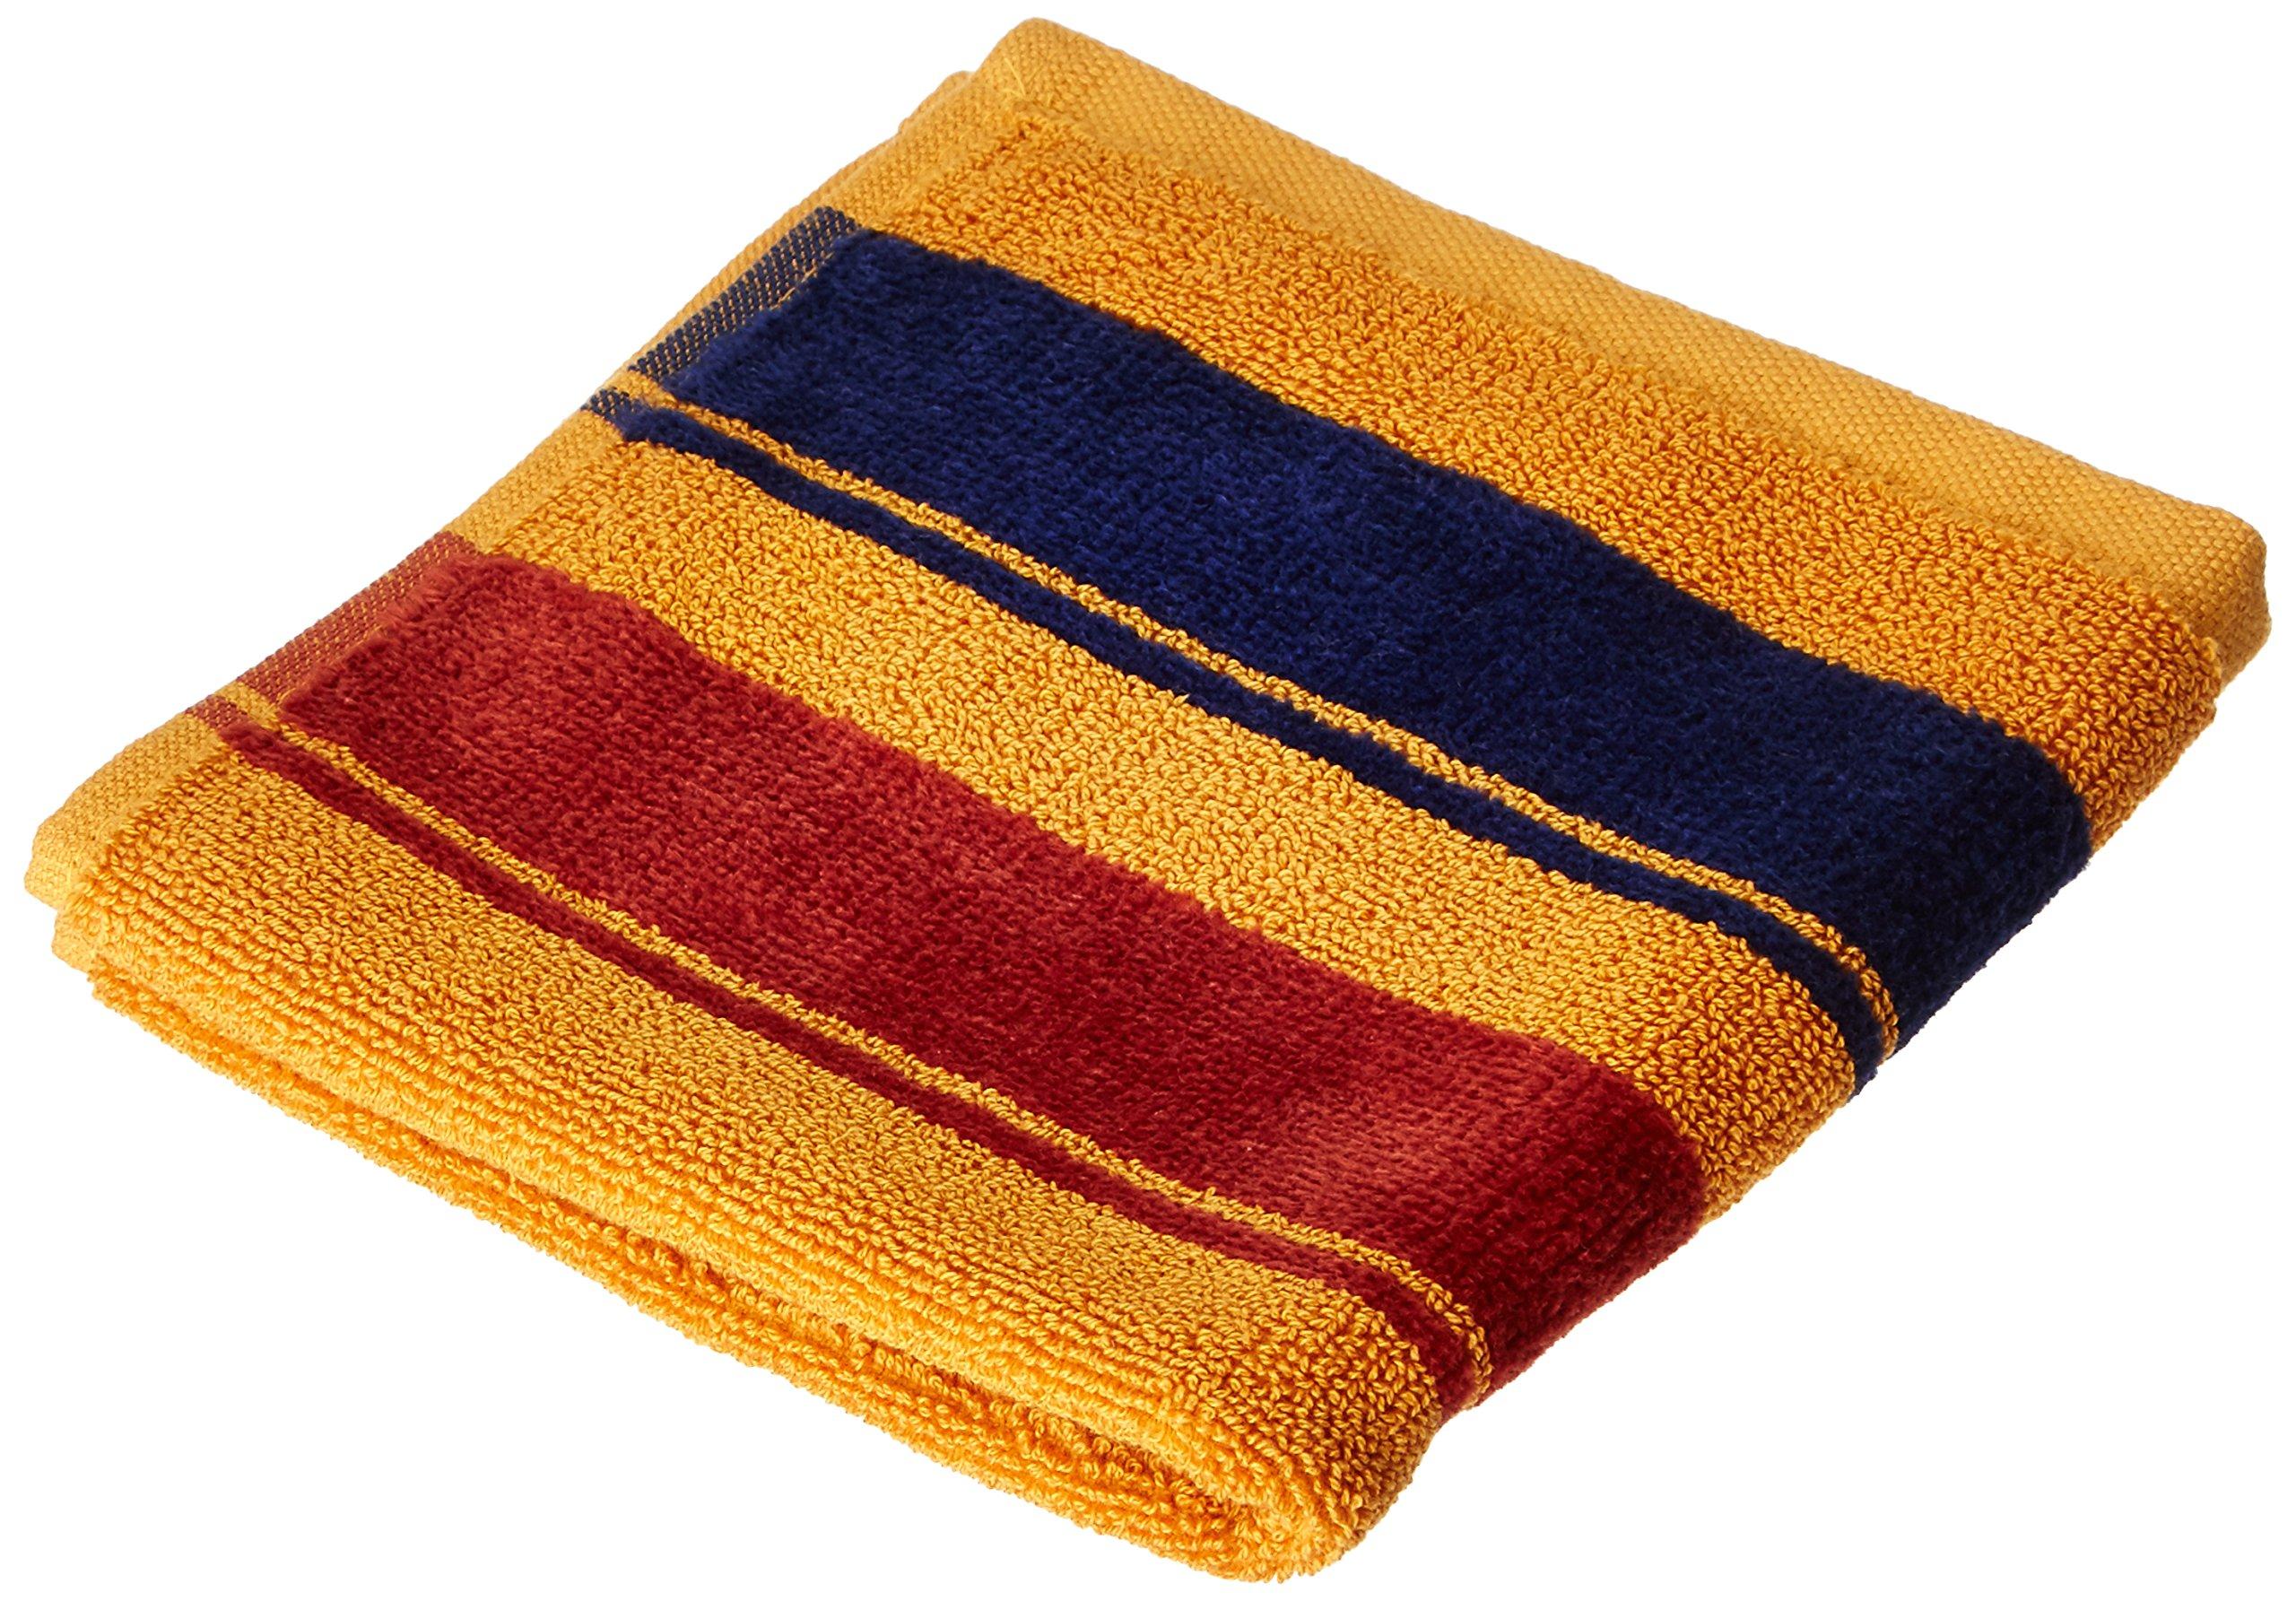 Pendleton National Park Wash Cloth, Yellowstone